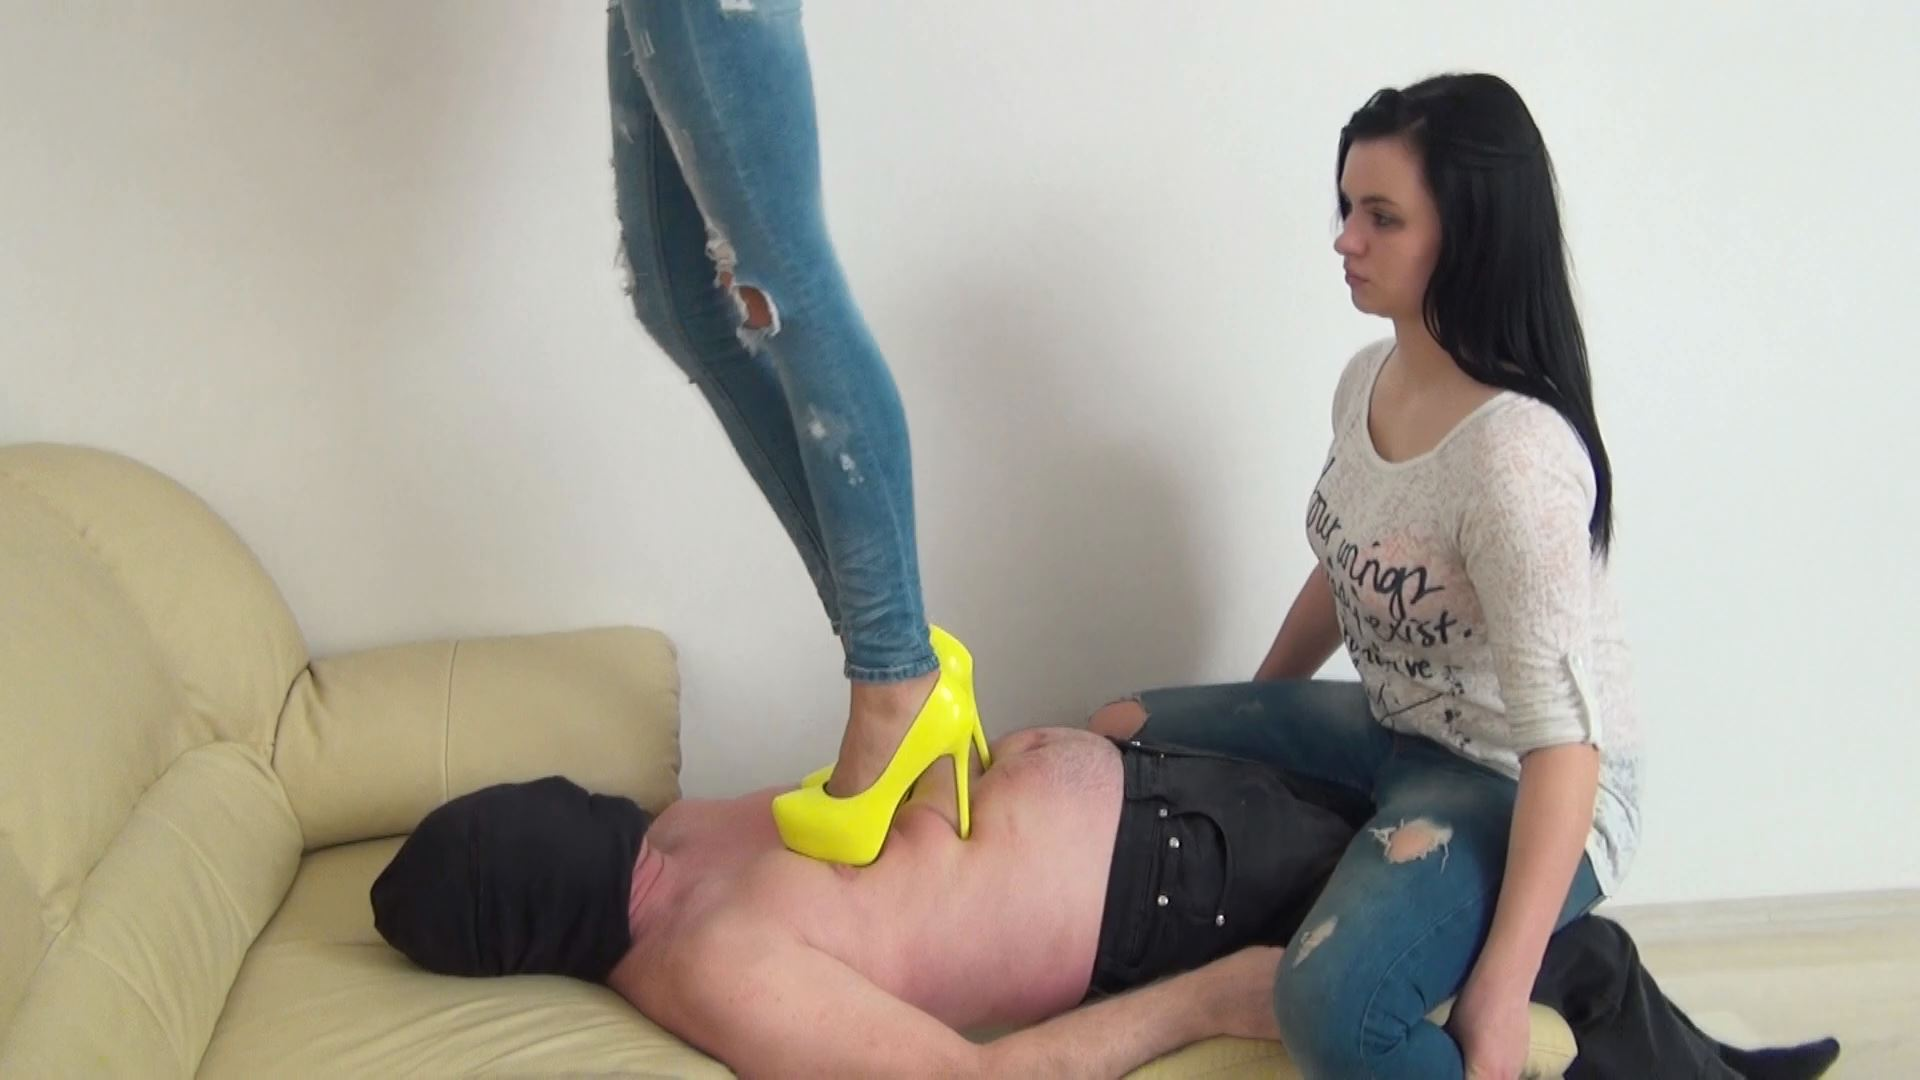 Mistress Sandy In Scene: Trampling in EXTREME high heels on human bridge - ABBIECATFETISH - FULL HD/1080p/MP4